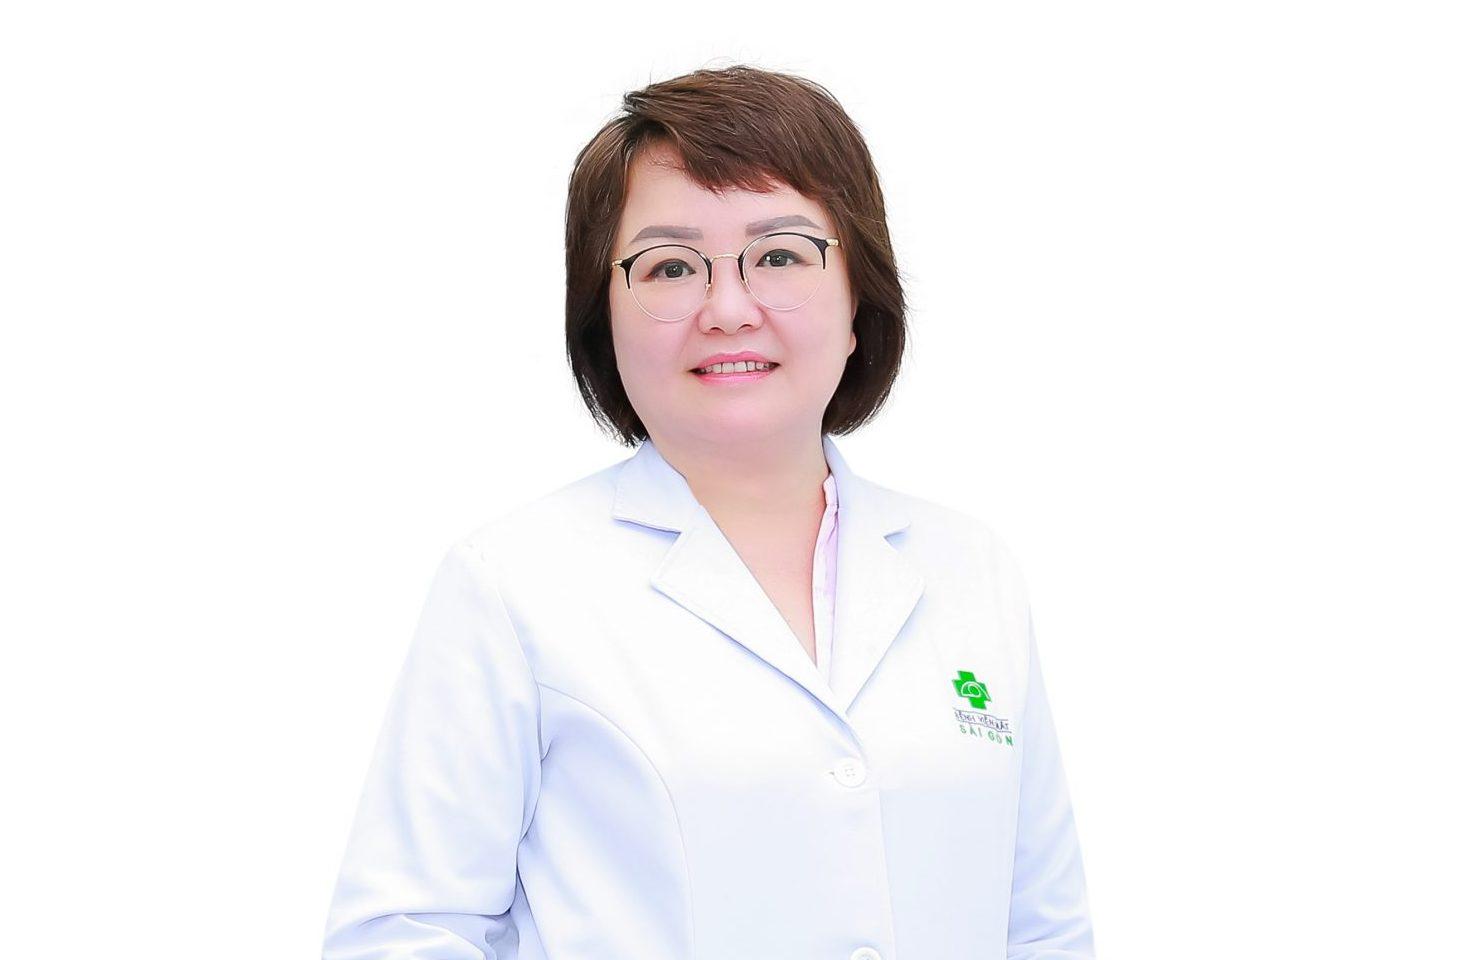 BS CKII Nguyễn Nam Trung